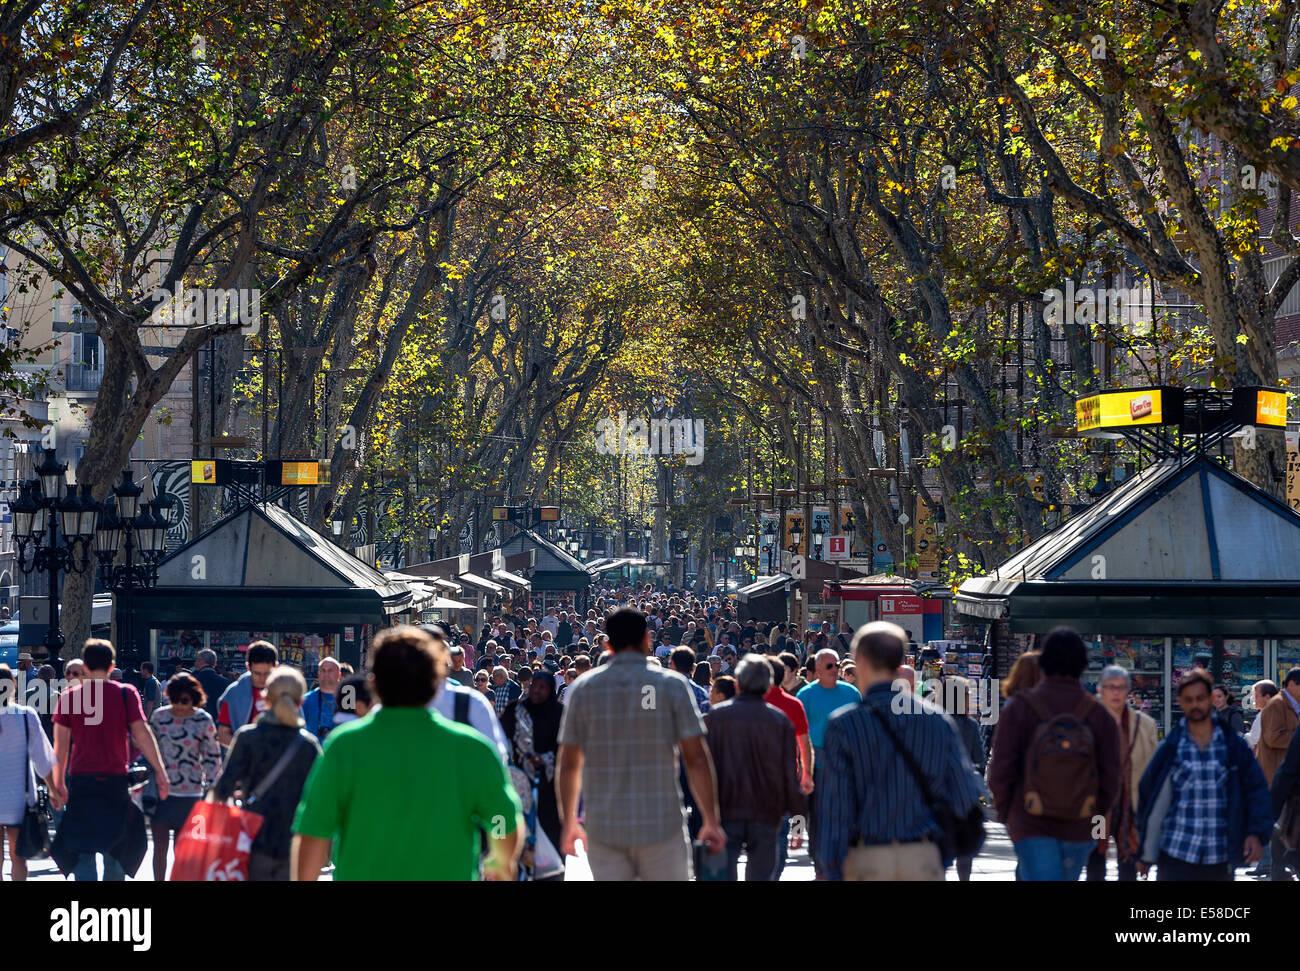 Tourists and Spaniards crowd the popular La Rambla area, Barcelona, Spain - Stock Image